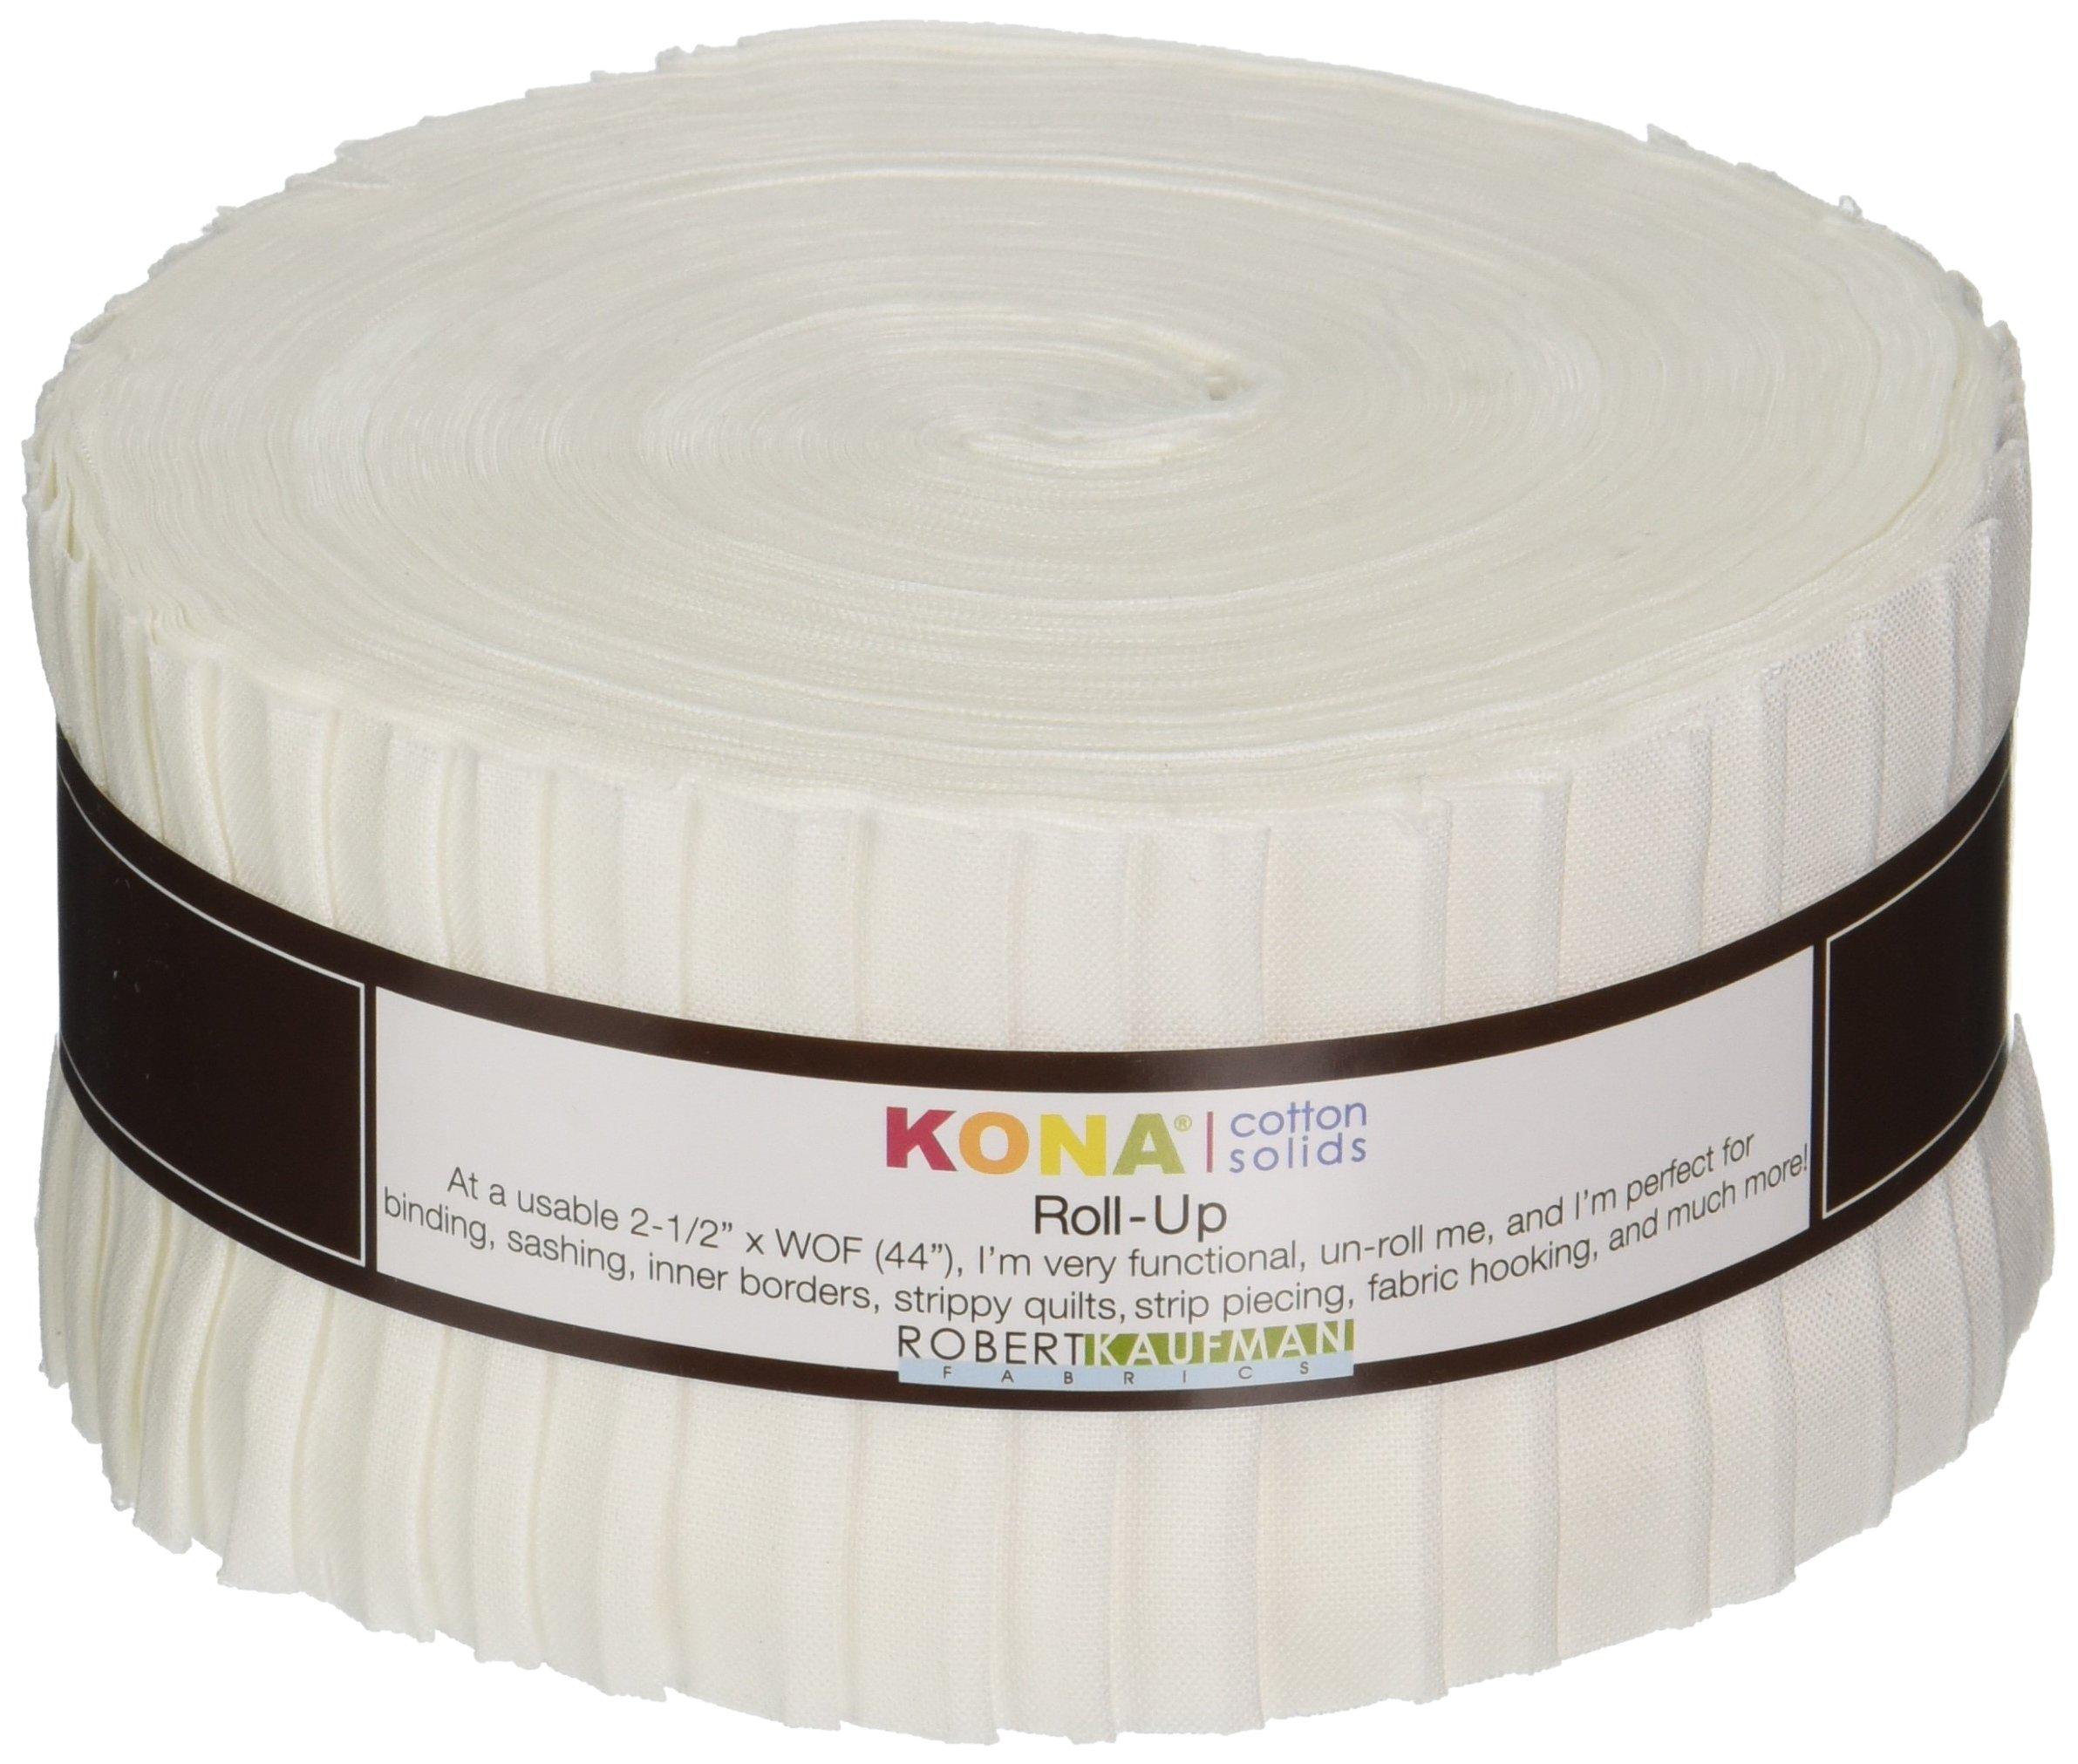 Robert Kaufman RU-190-40 Strips, 2.5-inch, White by Robert Kaufman (Image #1)